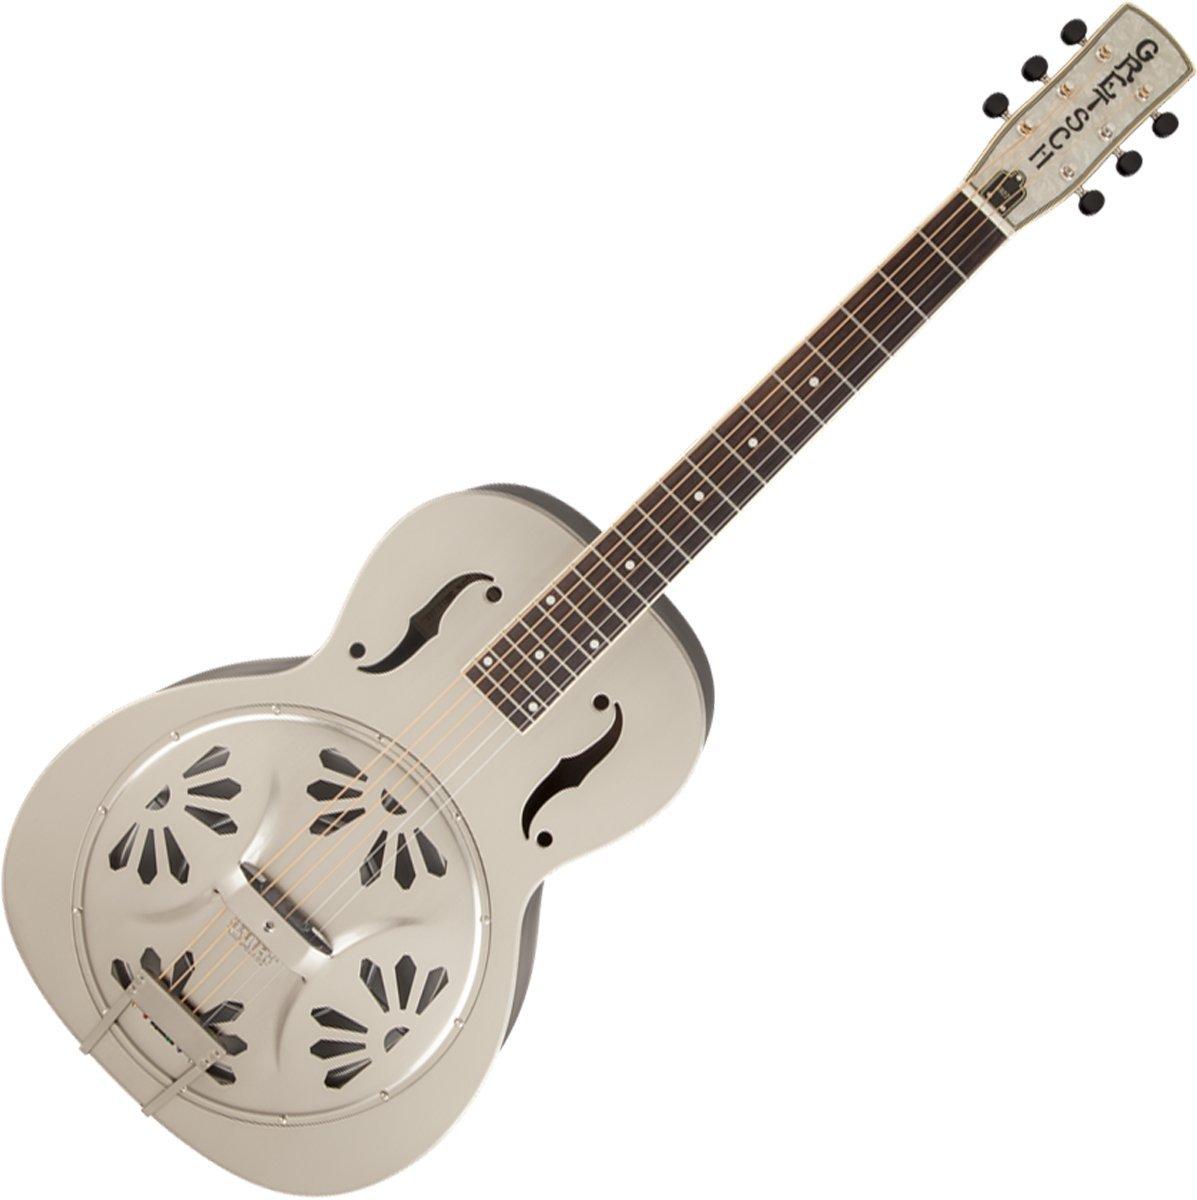 Gretsch G9221 Bobtail Steel Round Neck A/E Resonator Guitar with Paduak Fingerboard